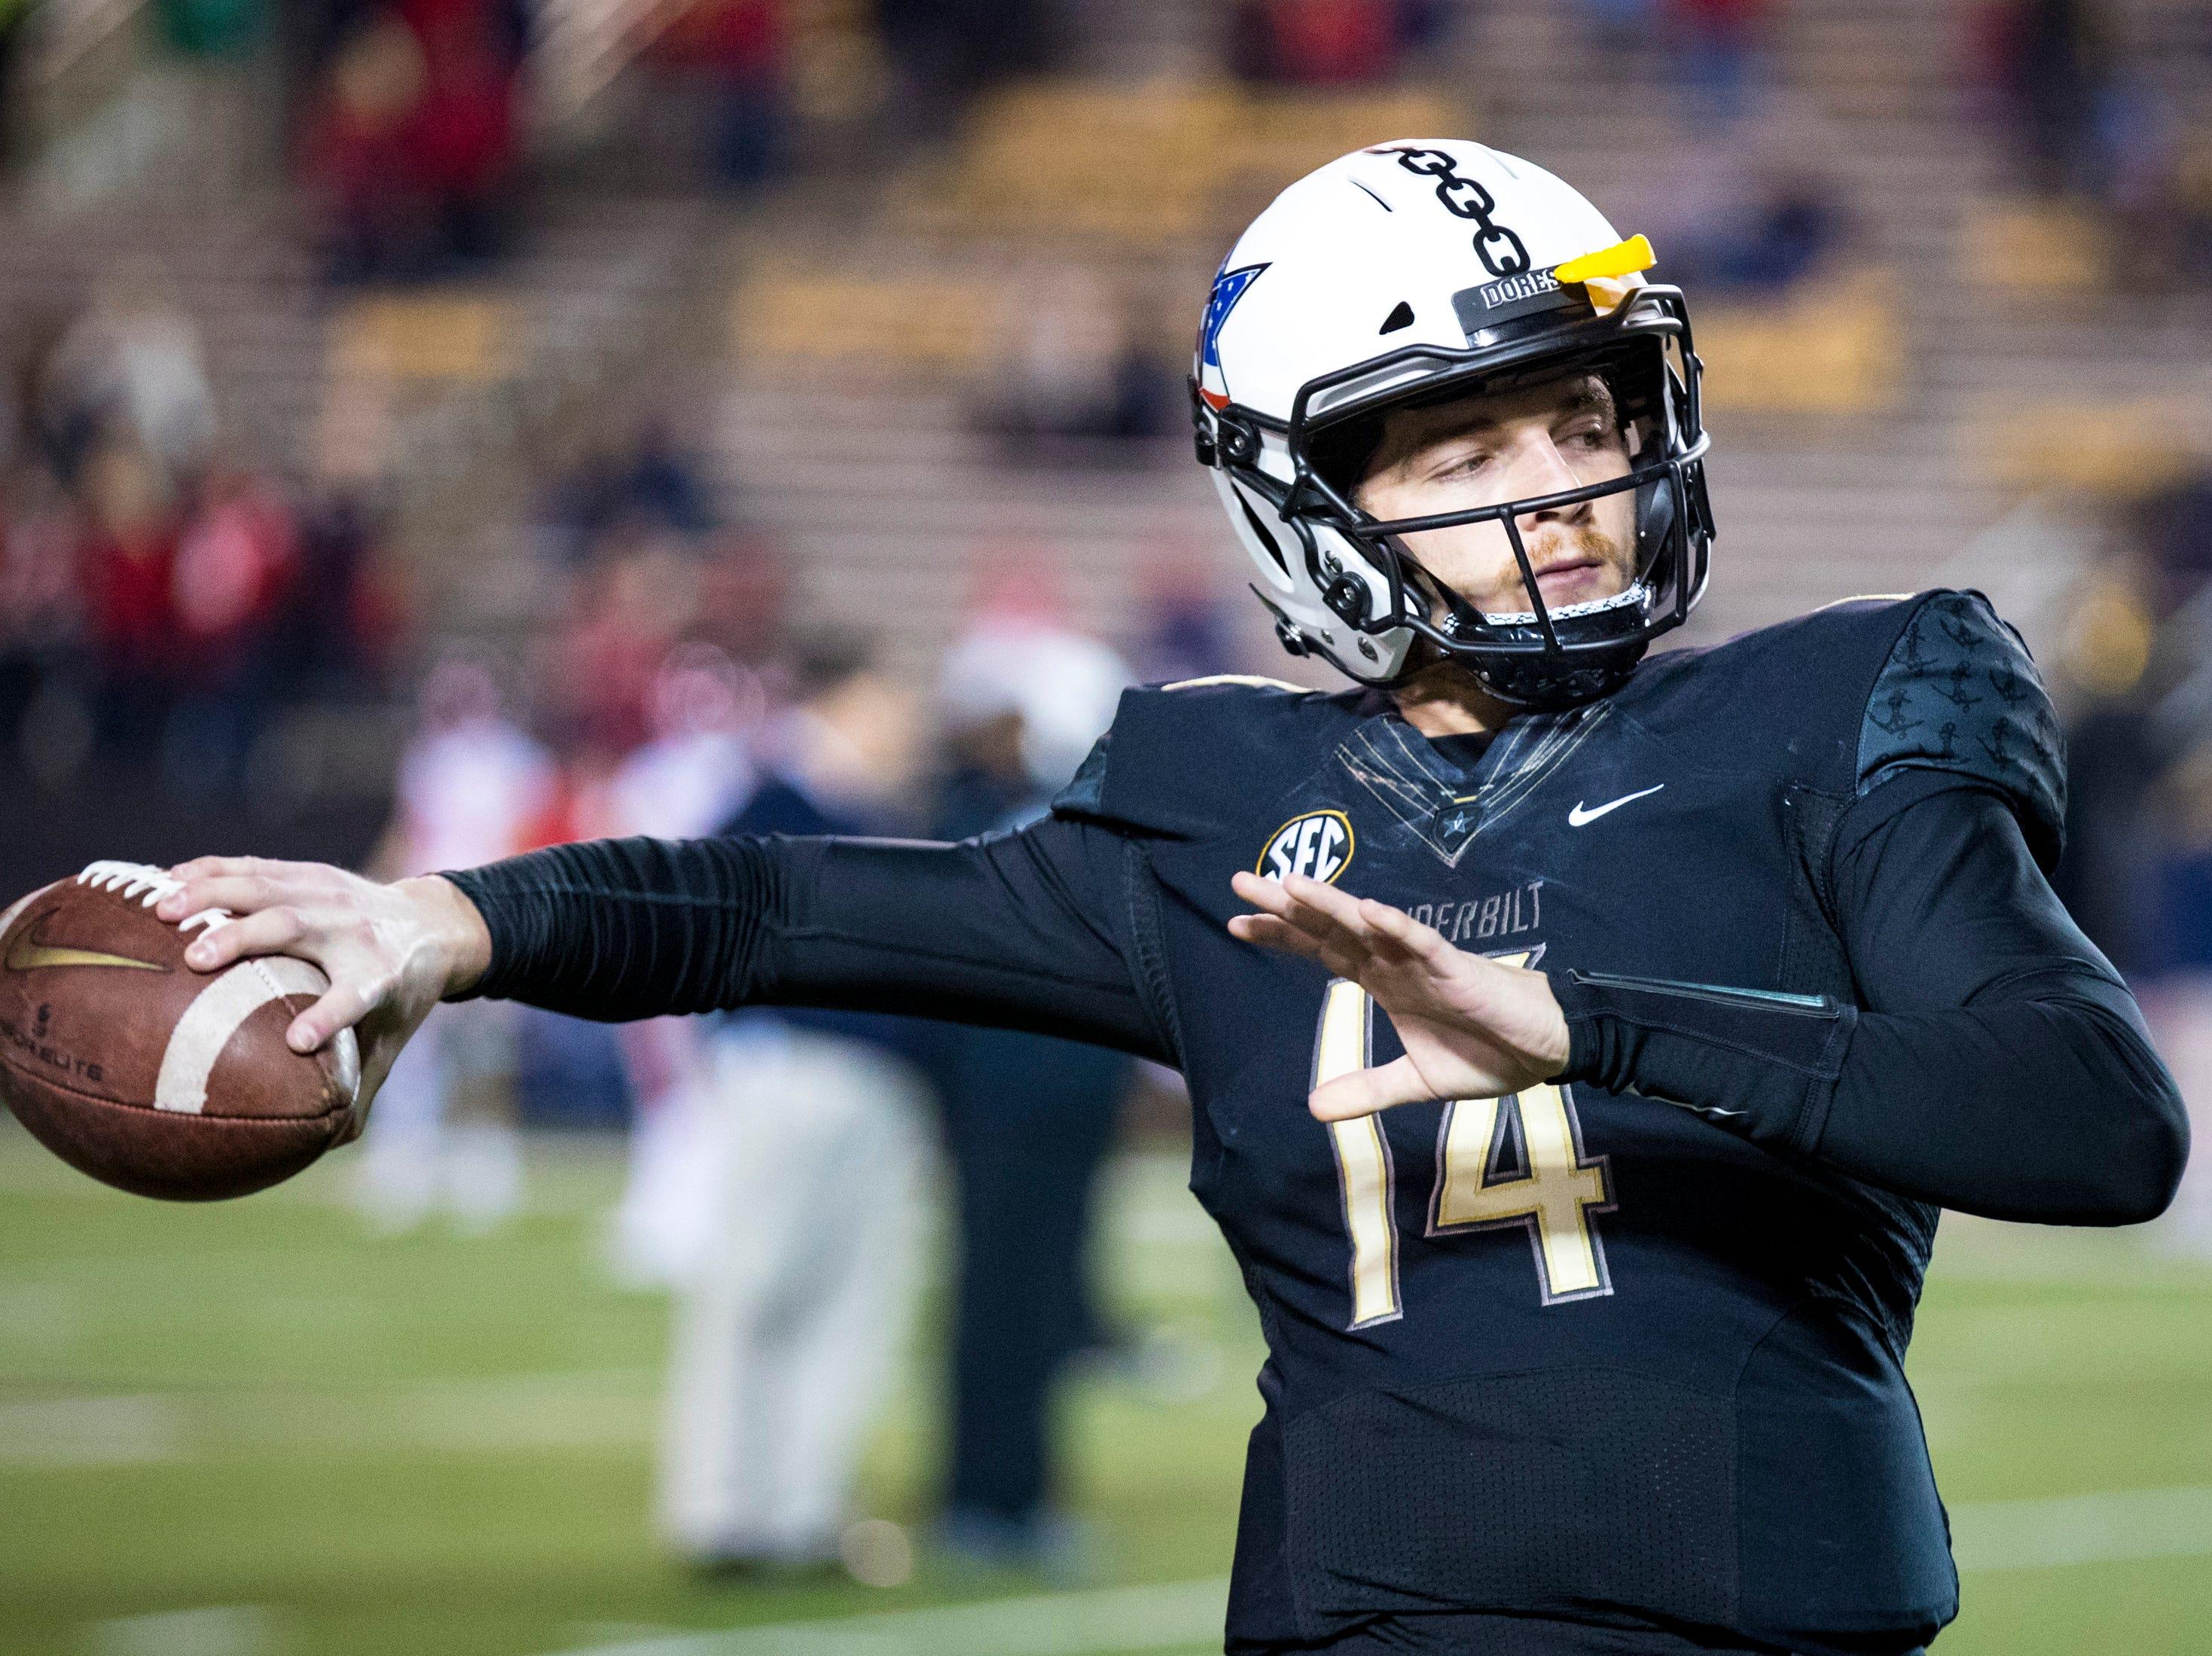 Vanderbilt quarterback Kyle Shurmur (14) warms up before Vanderbilt's game against Ole Miss at Vanderbilt Stadium in Nashville on Saturday, Nov. 17, 2018.